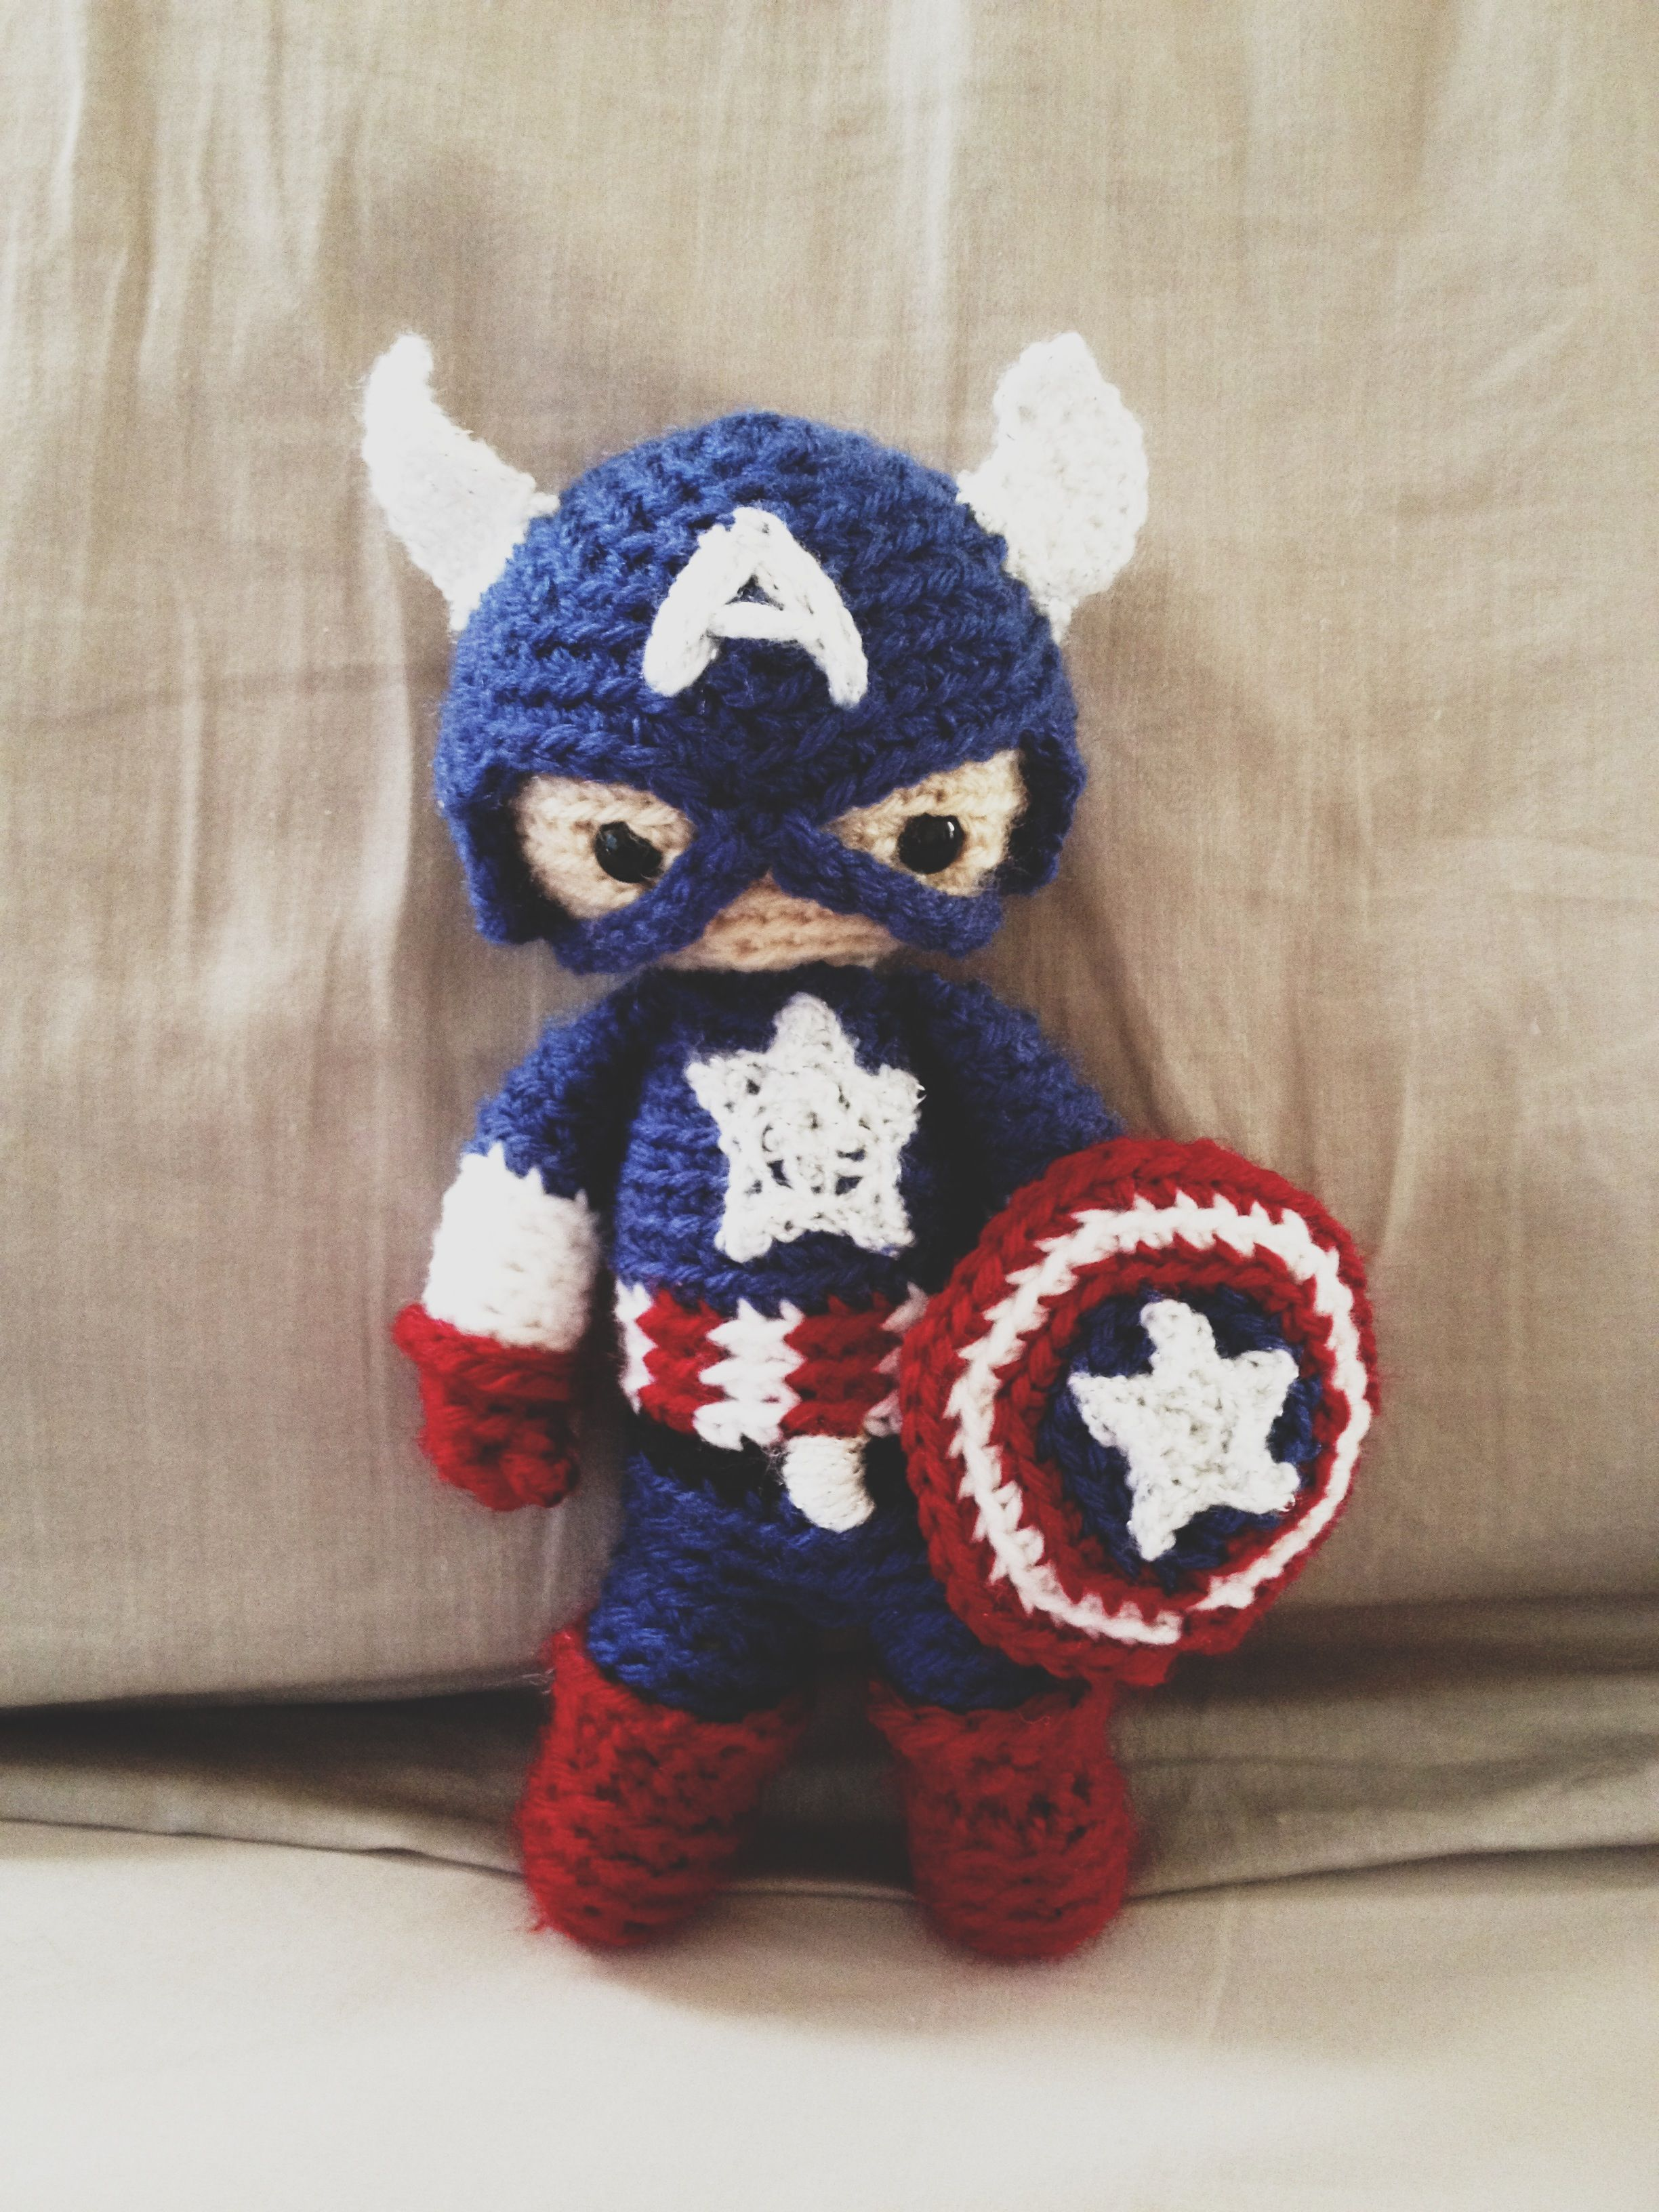 Crochet Captain America From Avengers Amigurumi That My Hubby Got